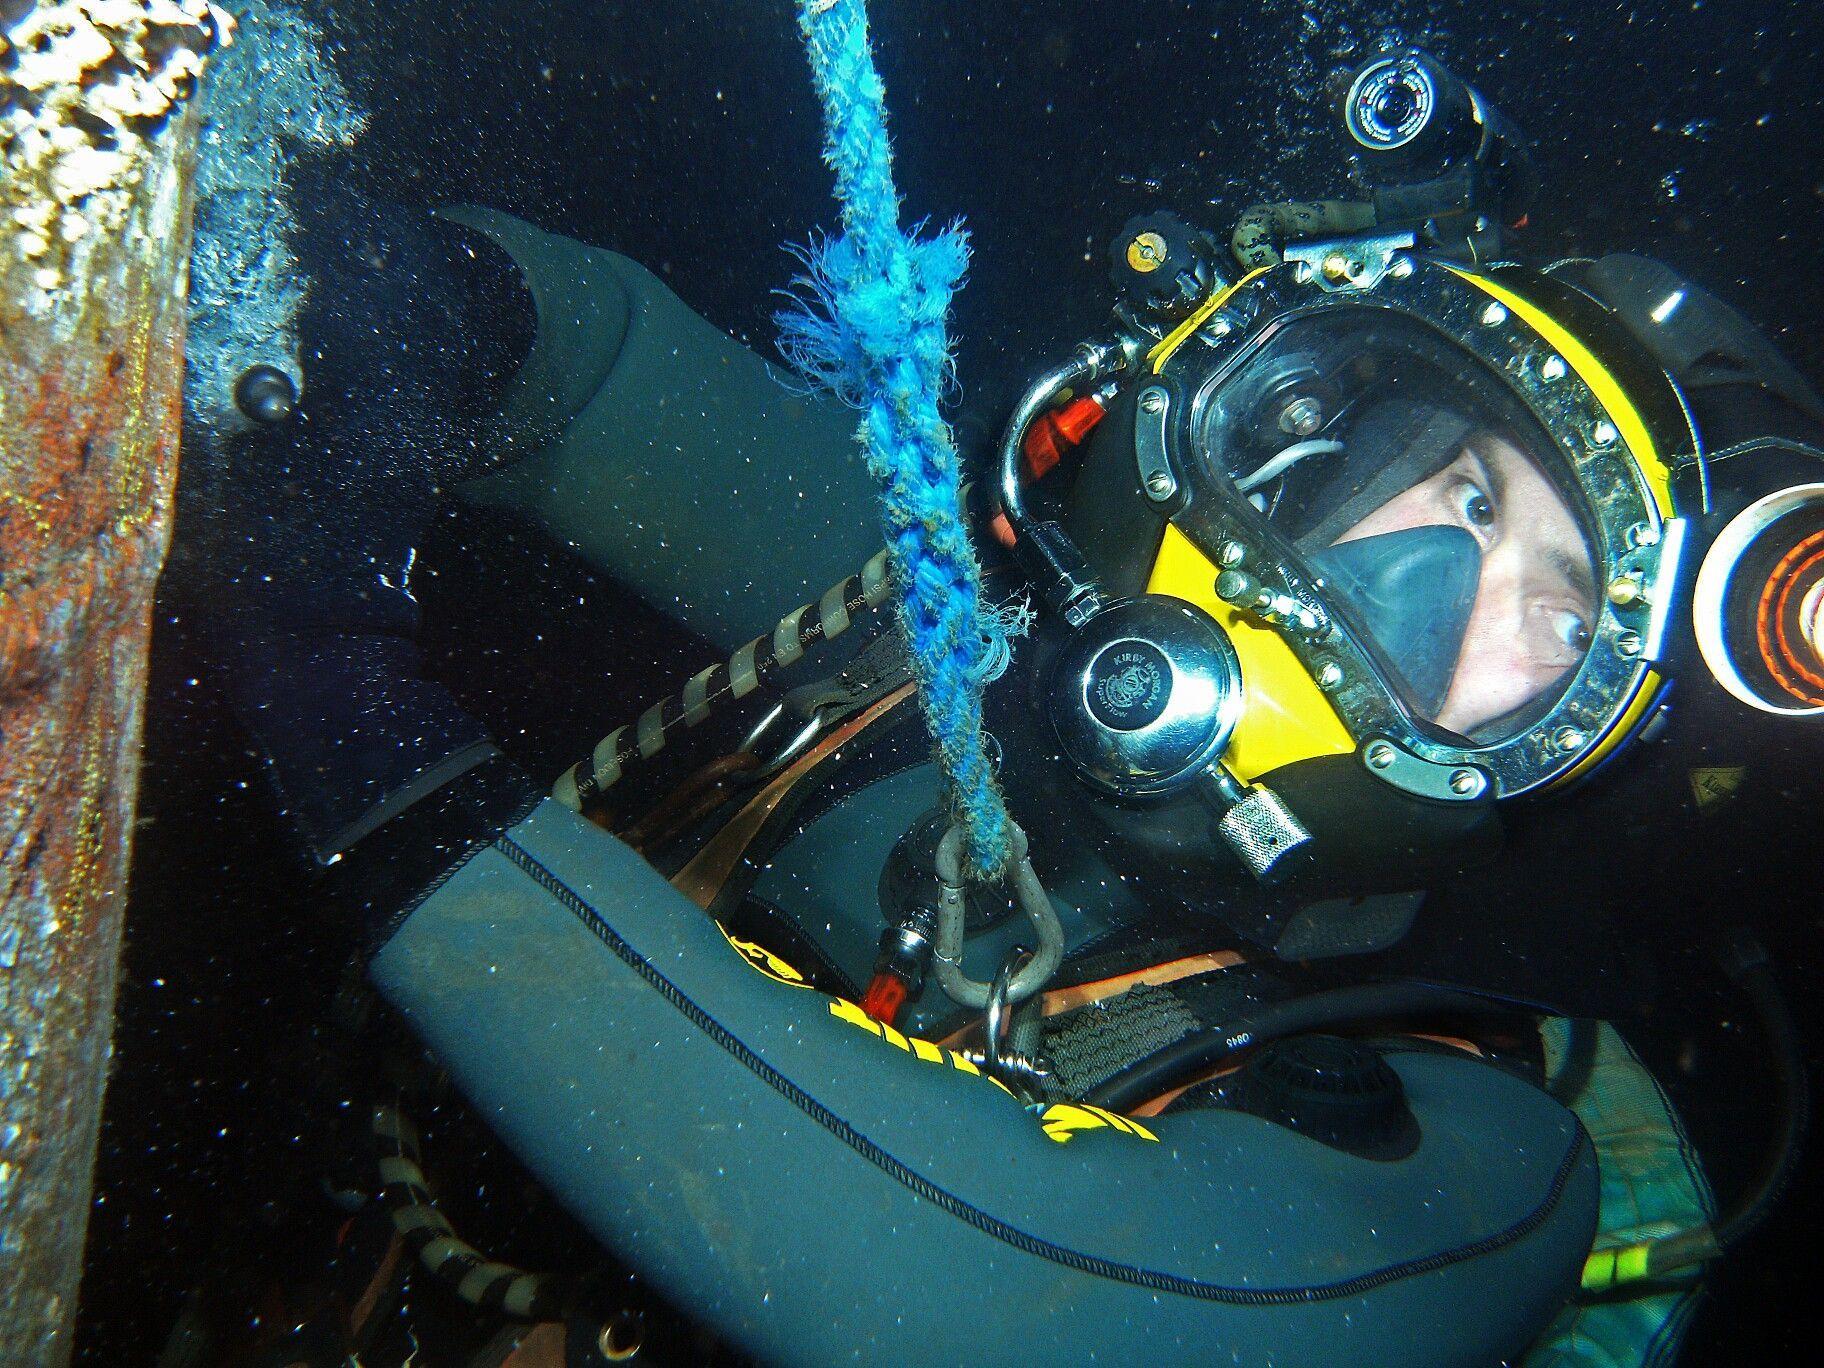 Kfdgroupcommercialdivingequipment Diving Diving Equipment Green River